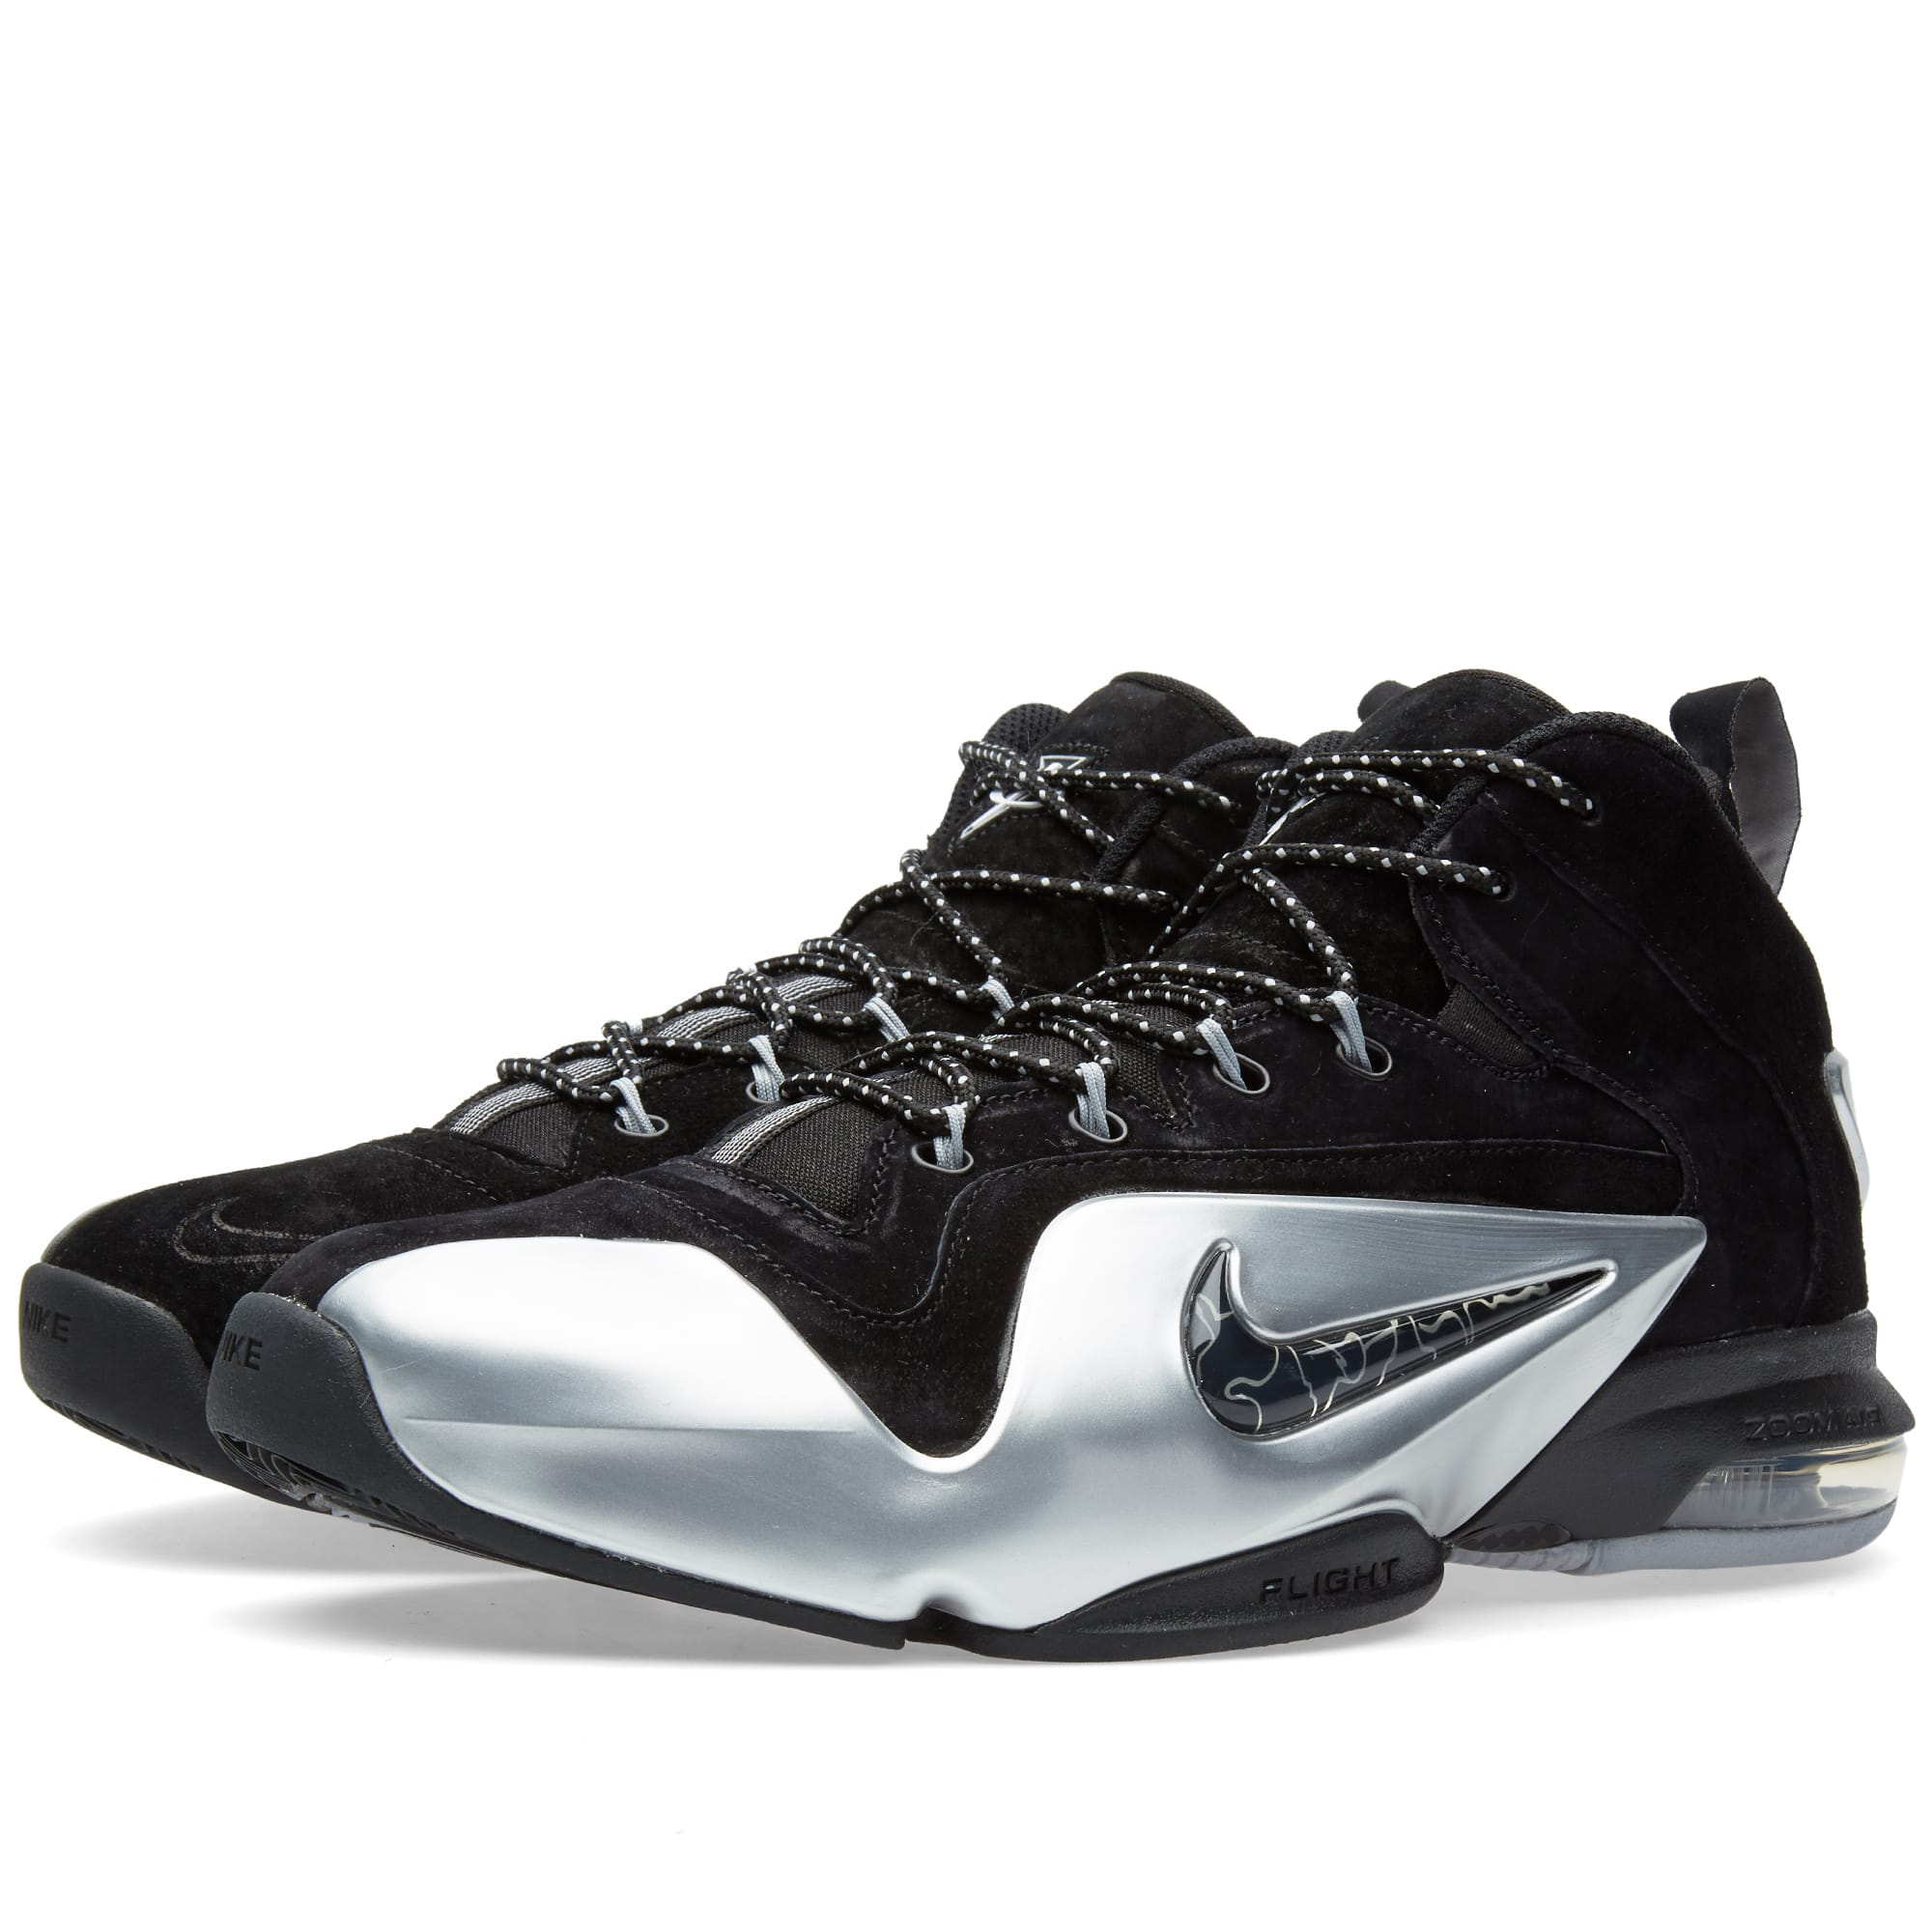 55cb80f85fa03 Nike Zoom Penny VI Black   Metallic Silver